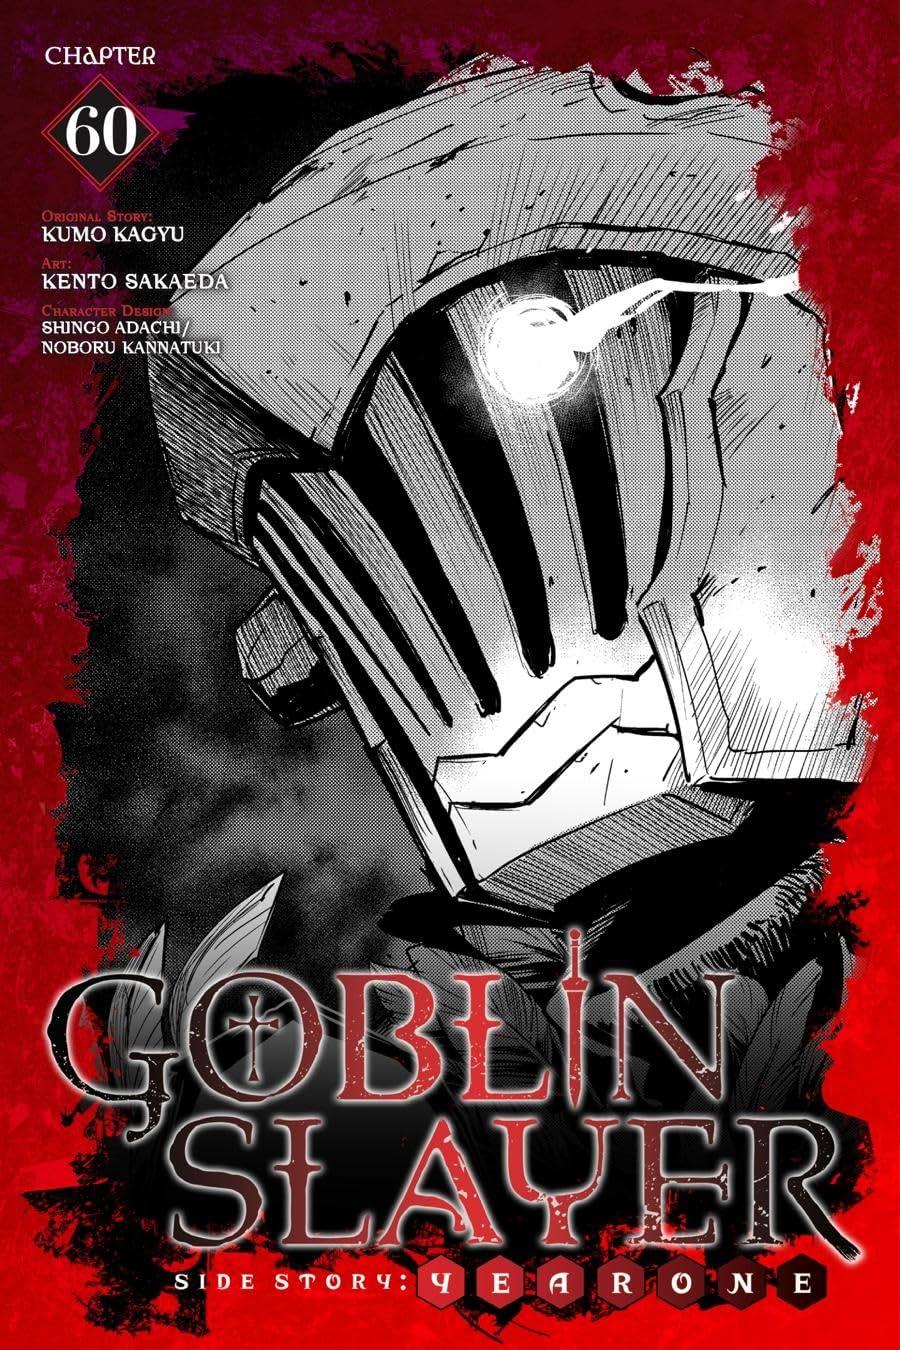 Goblin Slayer Side Story: Year One #60